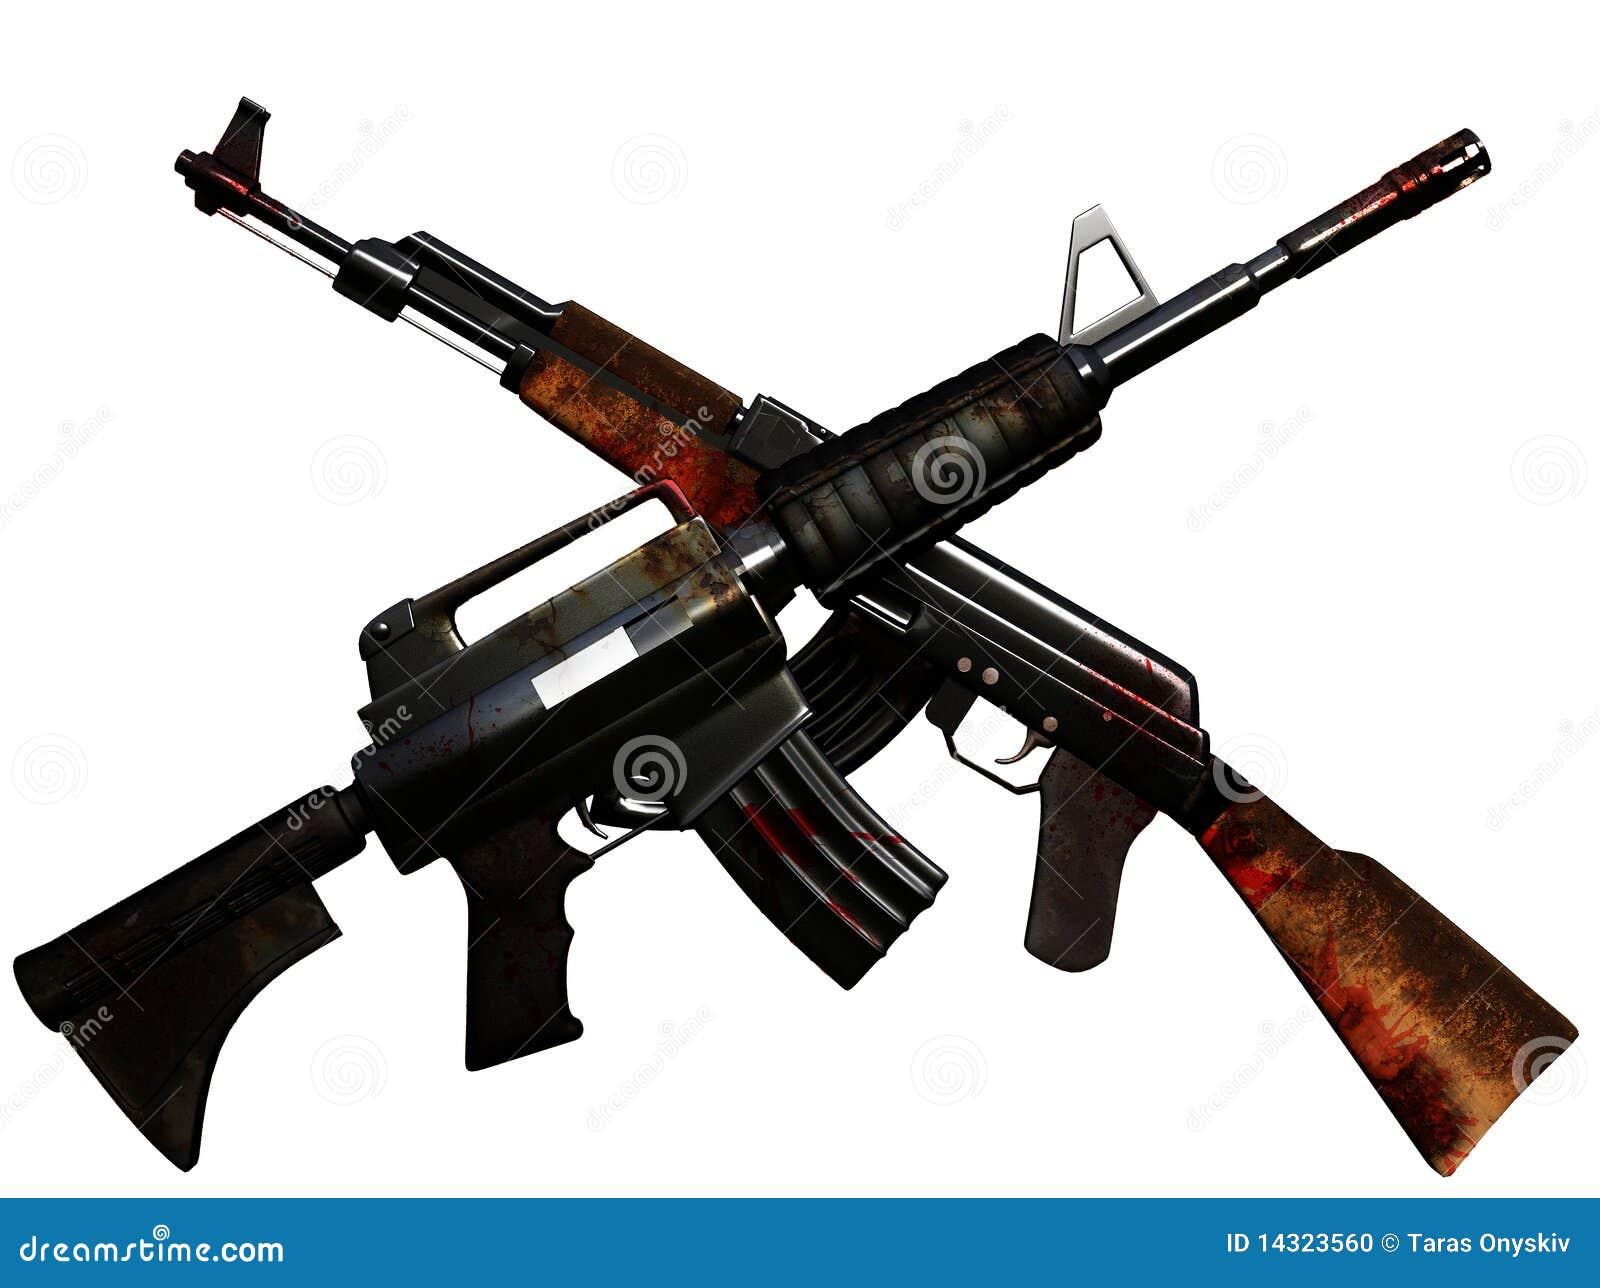 crossed machineguns stock photo image 14323560 ak 47 vector art ak 47 vector .cdr